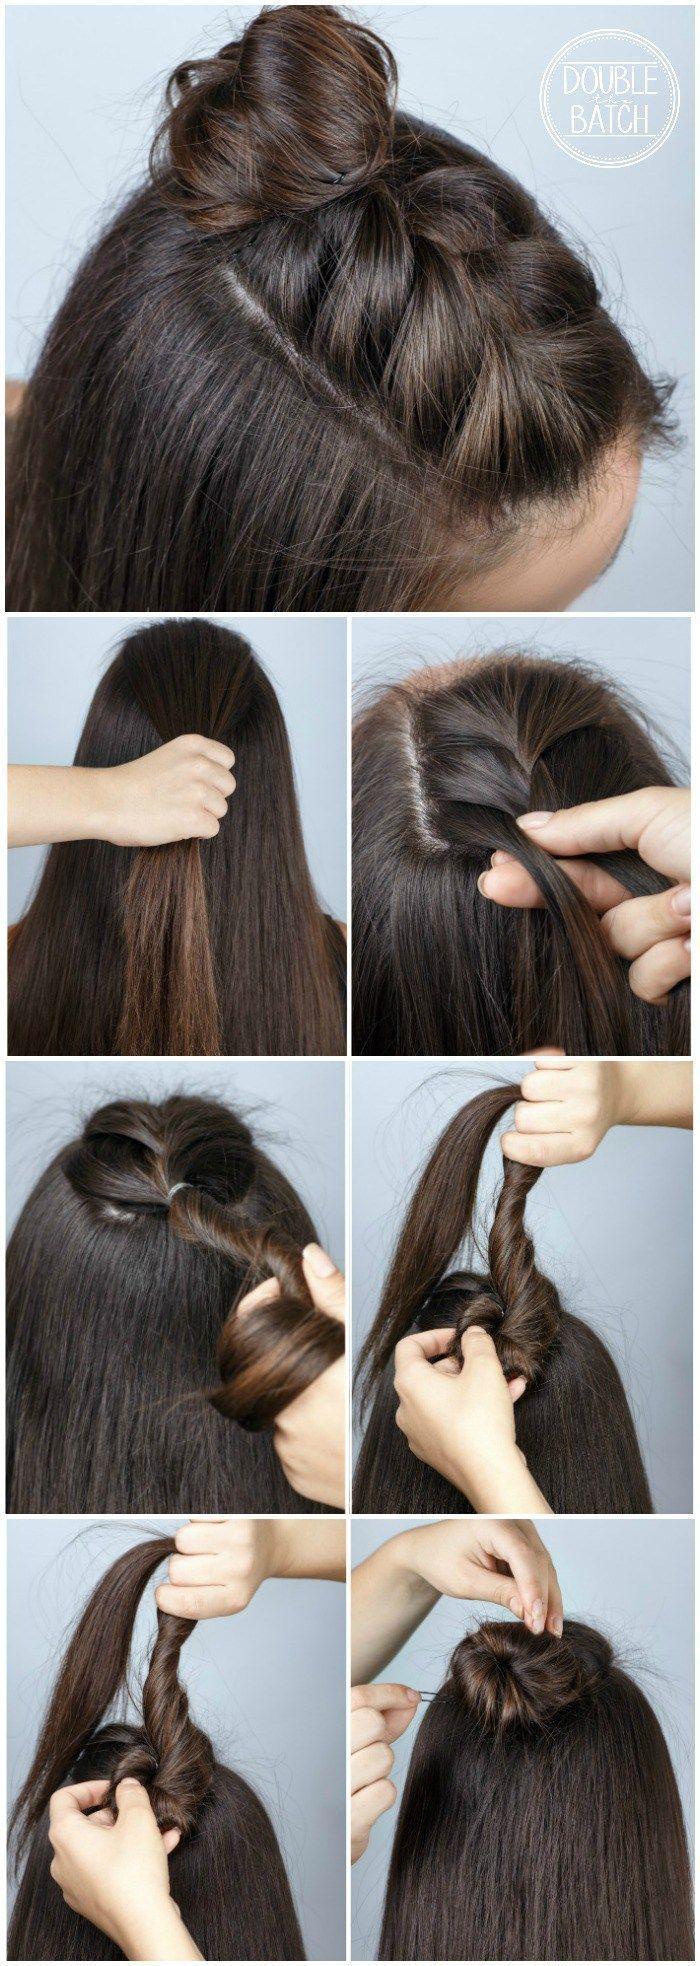 Easy Half Braid Frisur Tutorial - Video Frisur Tutorial - #Braid #Easy #Frisur #Tutorial #Vídeo